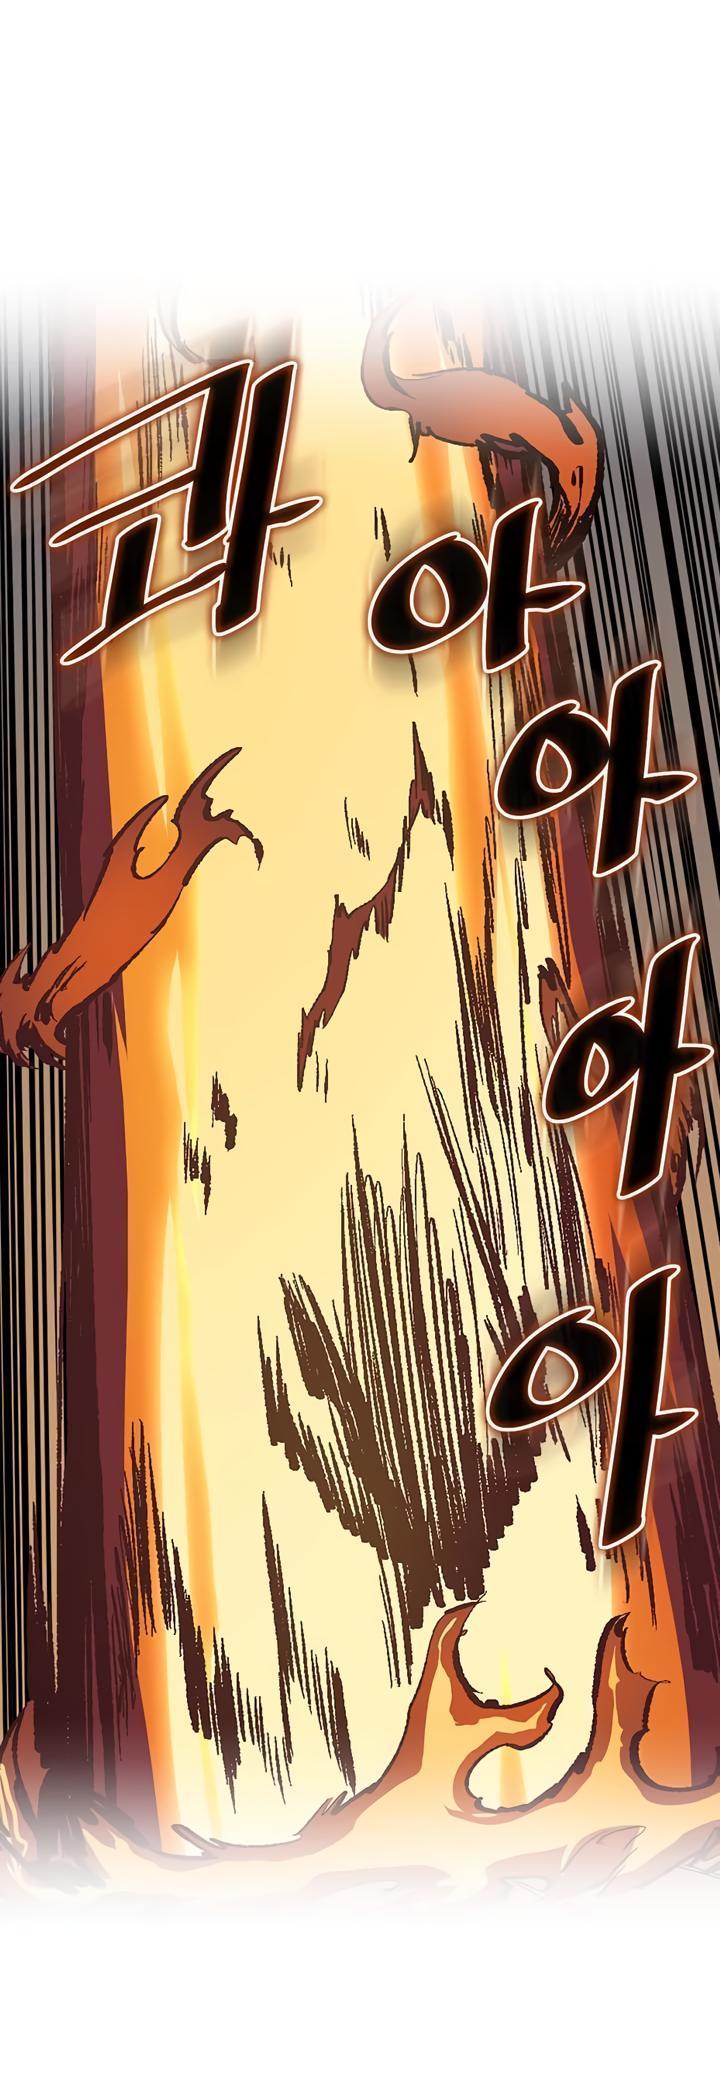 A Returner's Magic Should Be Special Chapter 35 page 10 - Mangakakalots.com